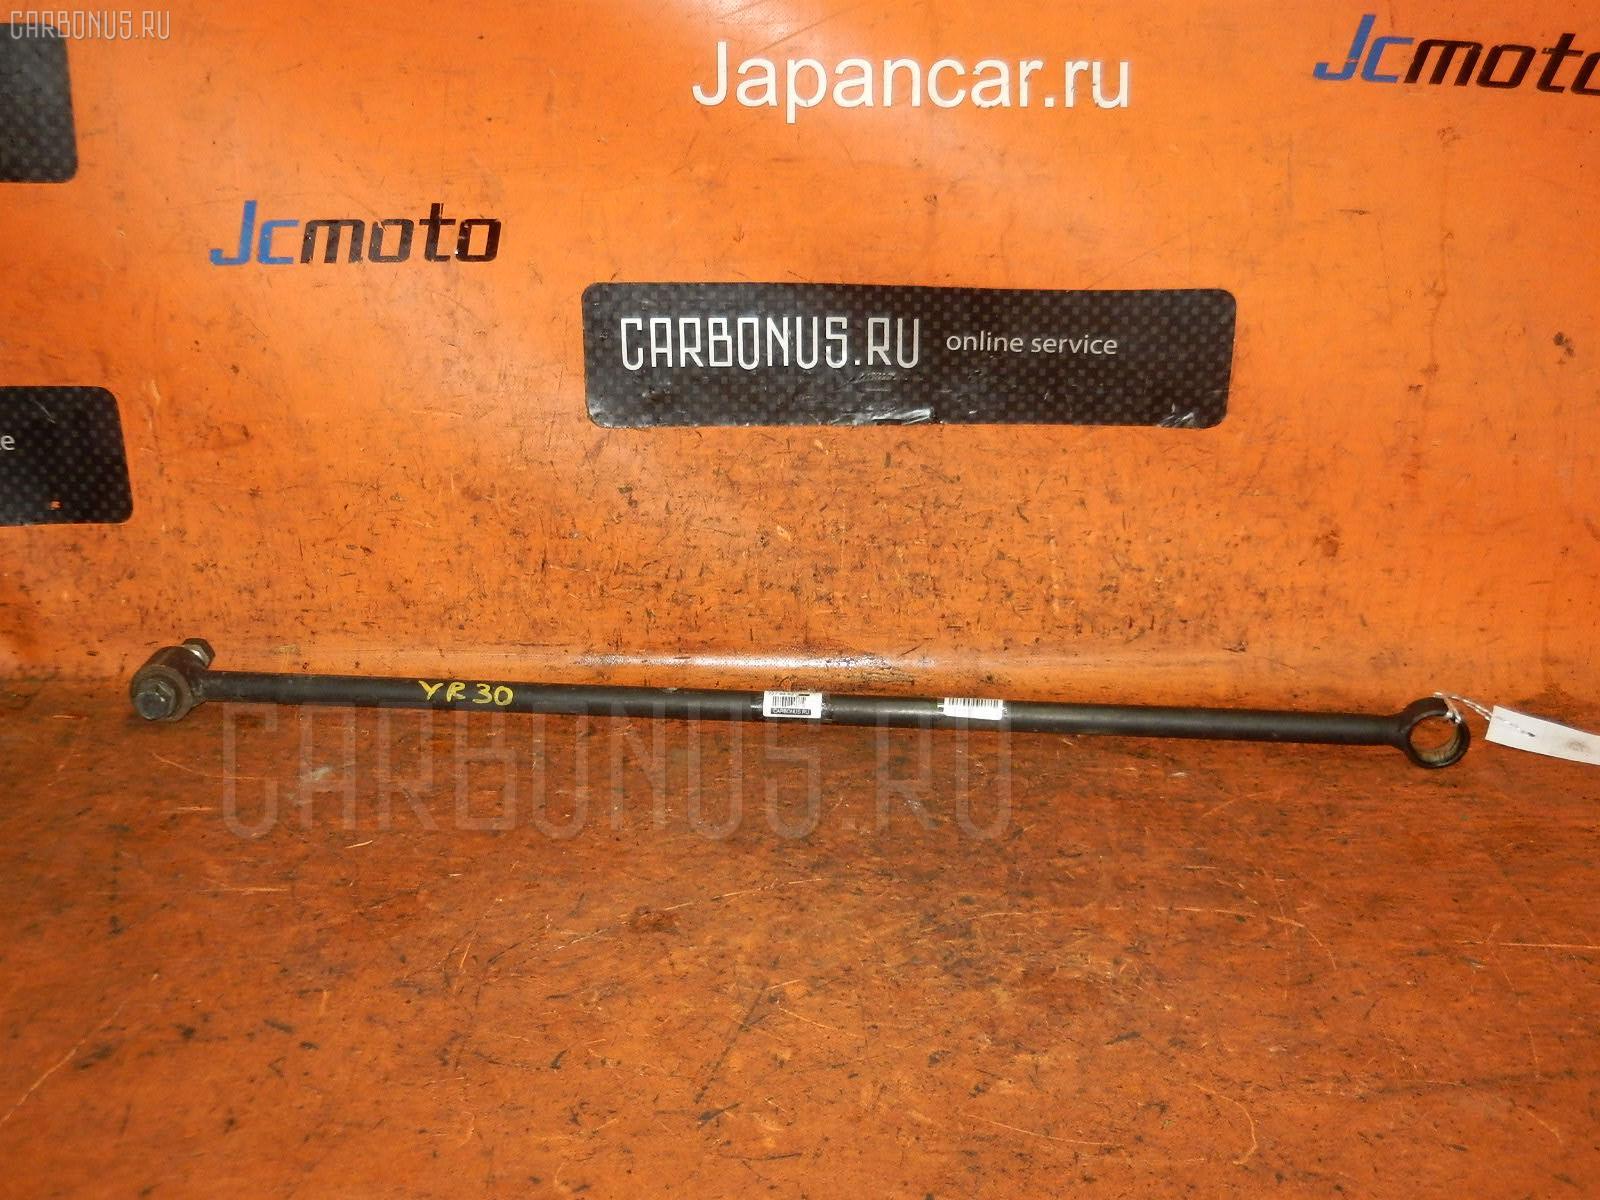 Тяга реактивная Toyota Master ace surf YR30G Фото 1